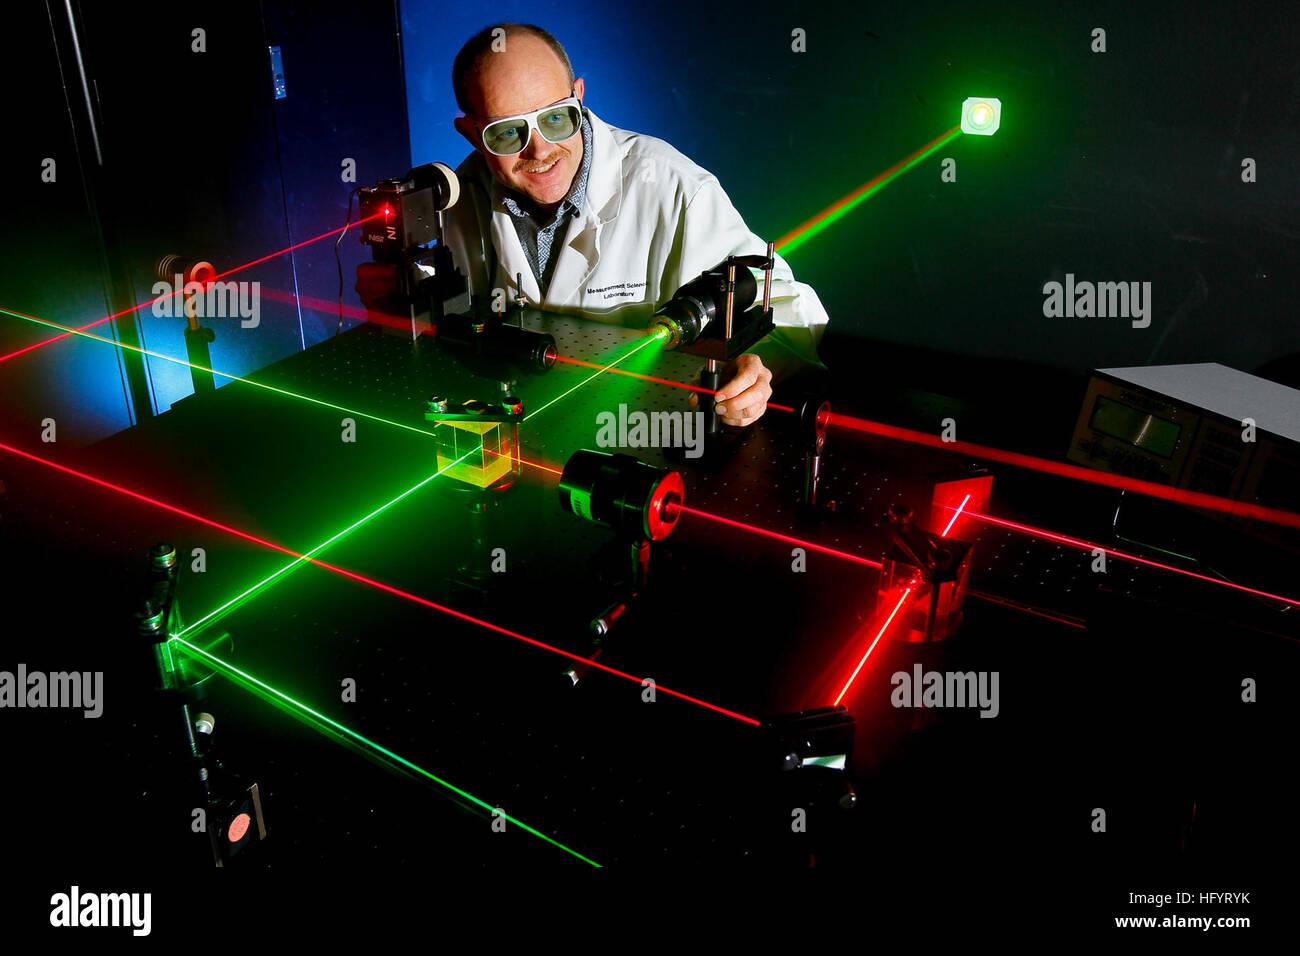 Infrarot Entfernungsmesser Erfahrungen : Laser entfernungsmesser stockfotos